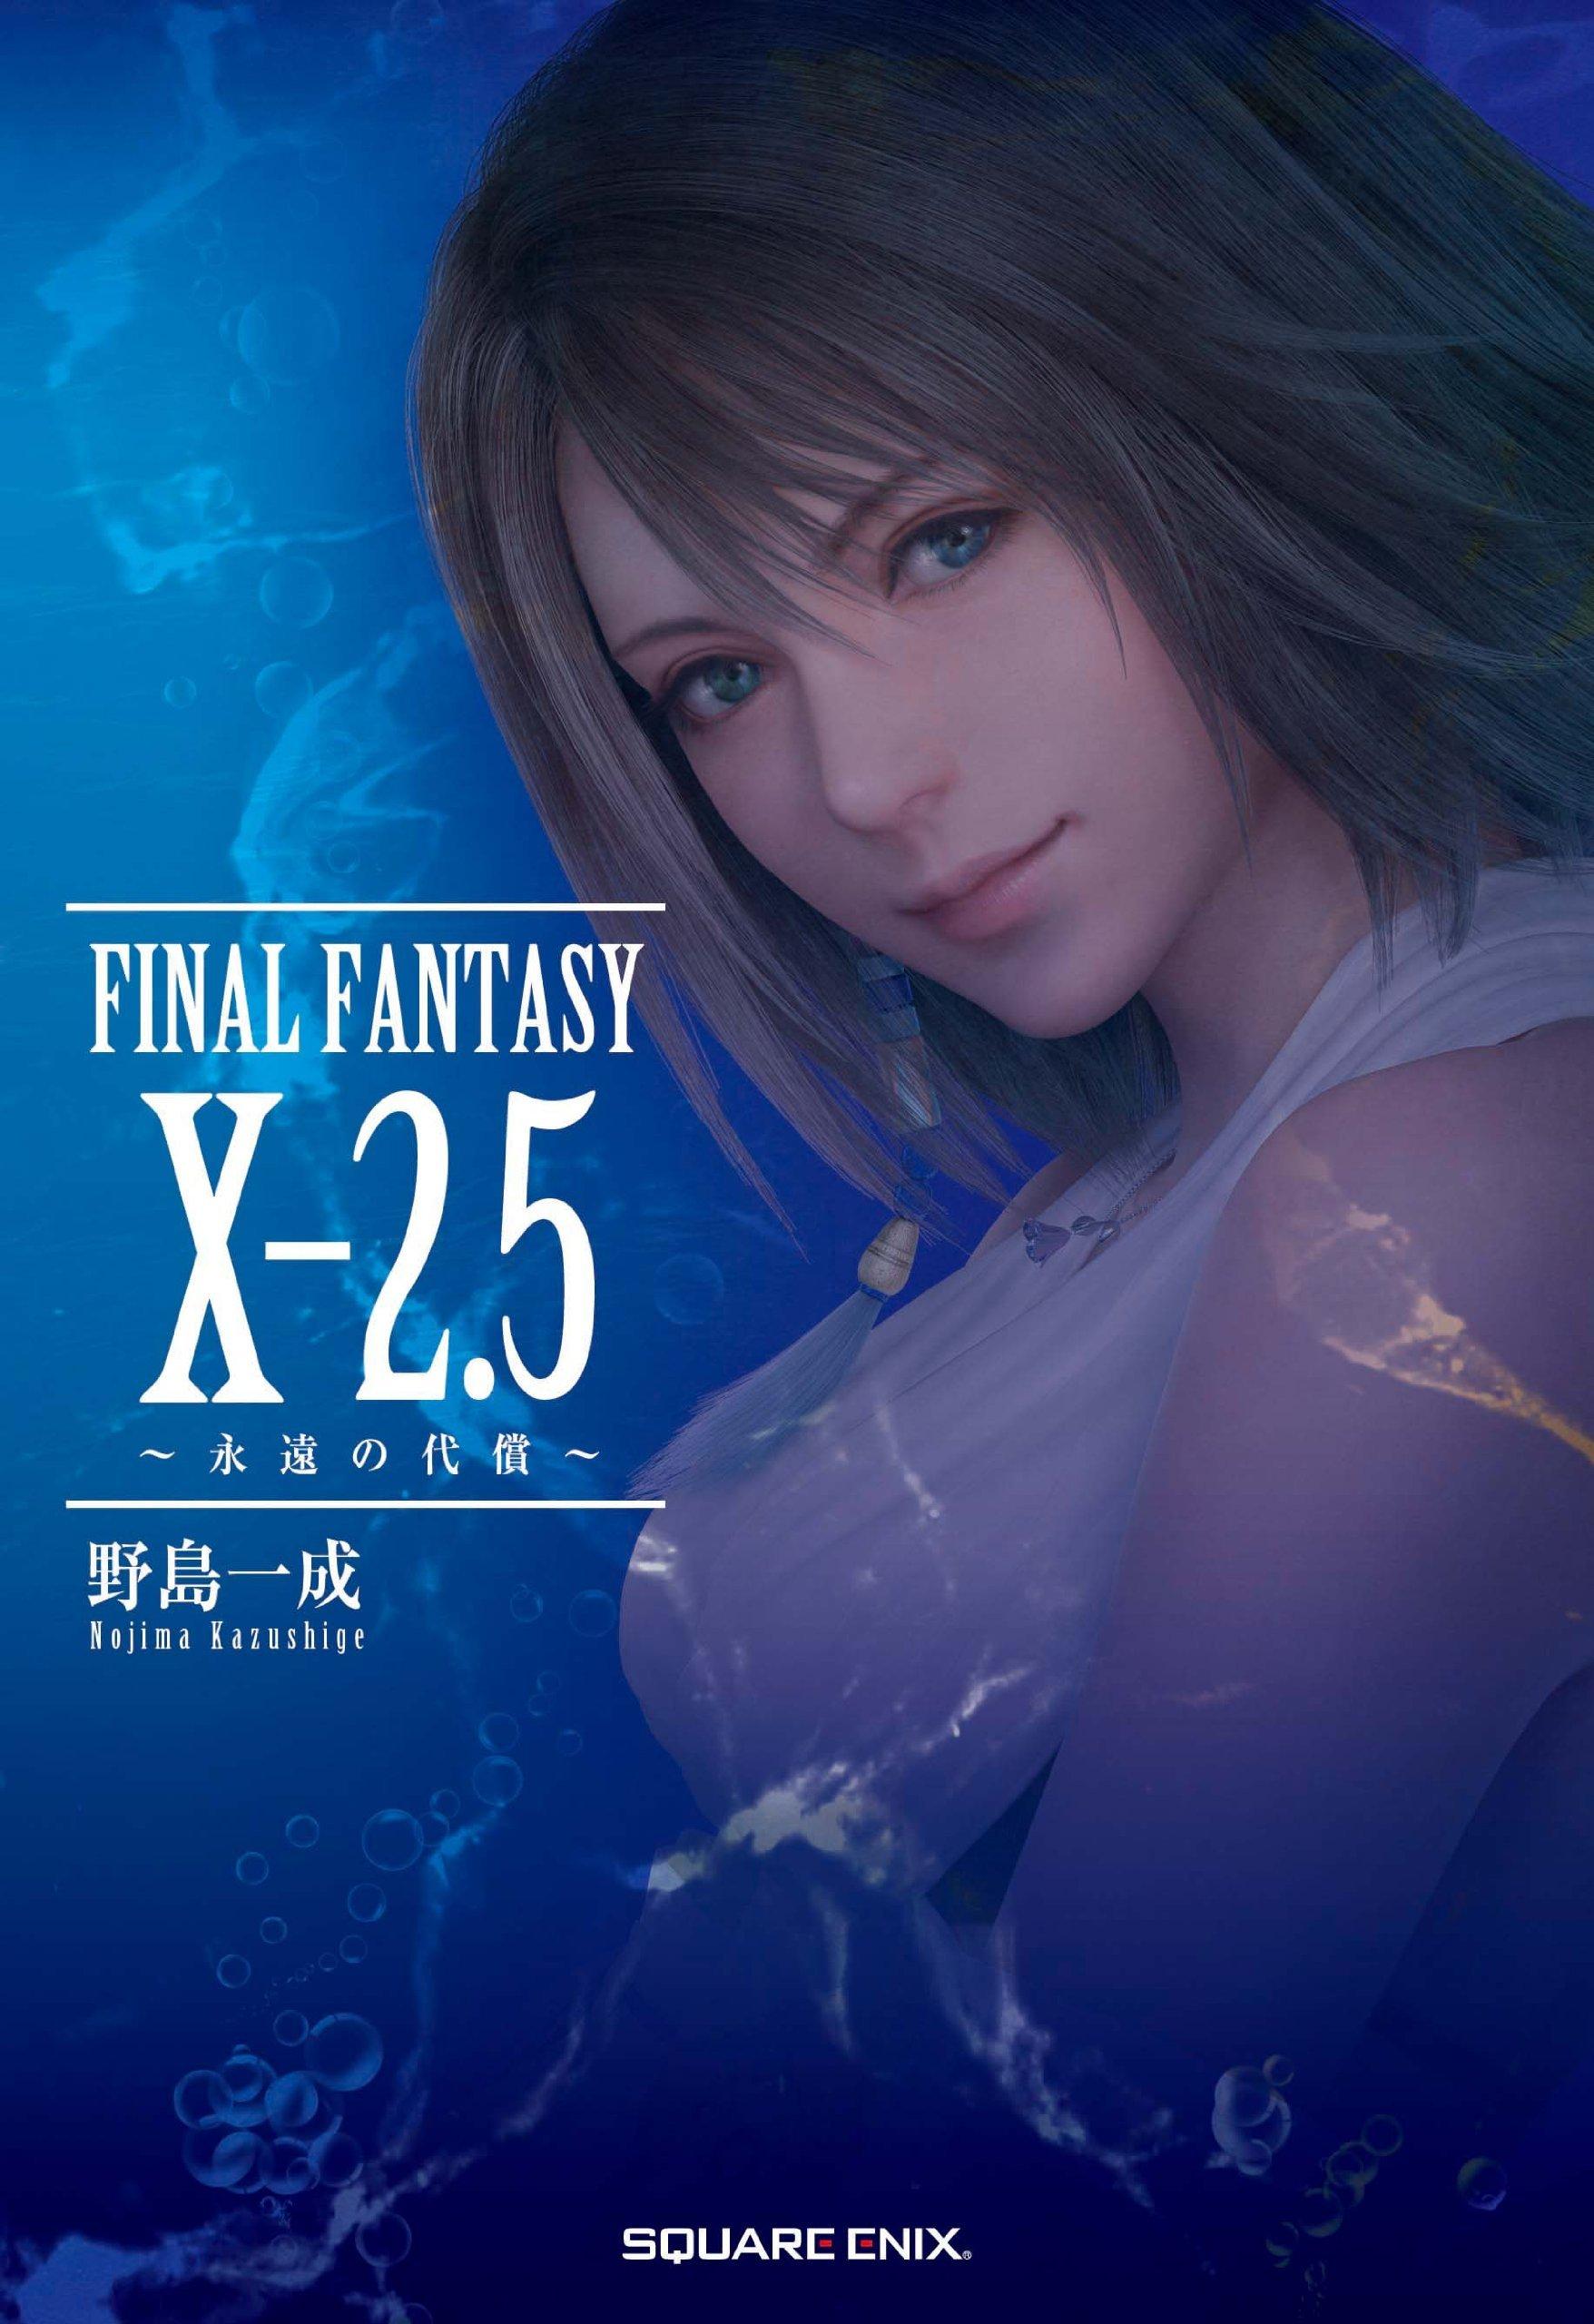 Final Fantasy X-2.5 ~Eien no Daishō~